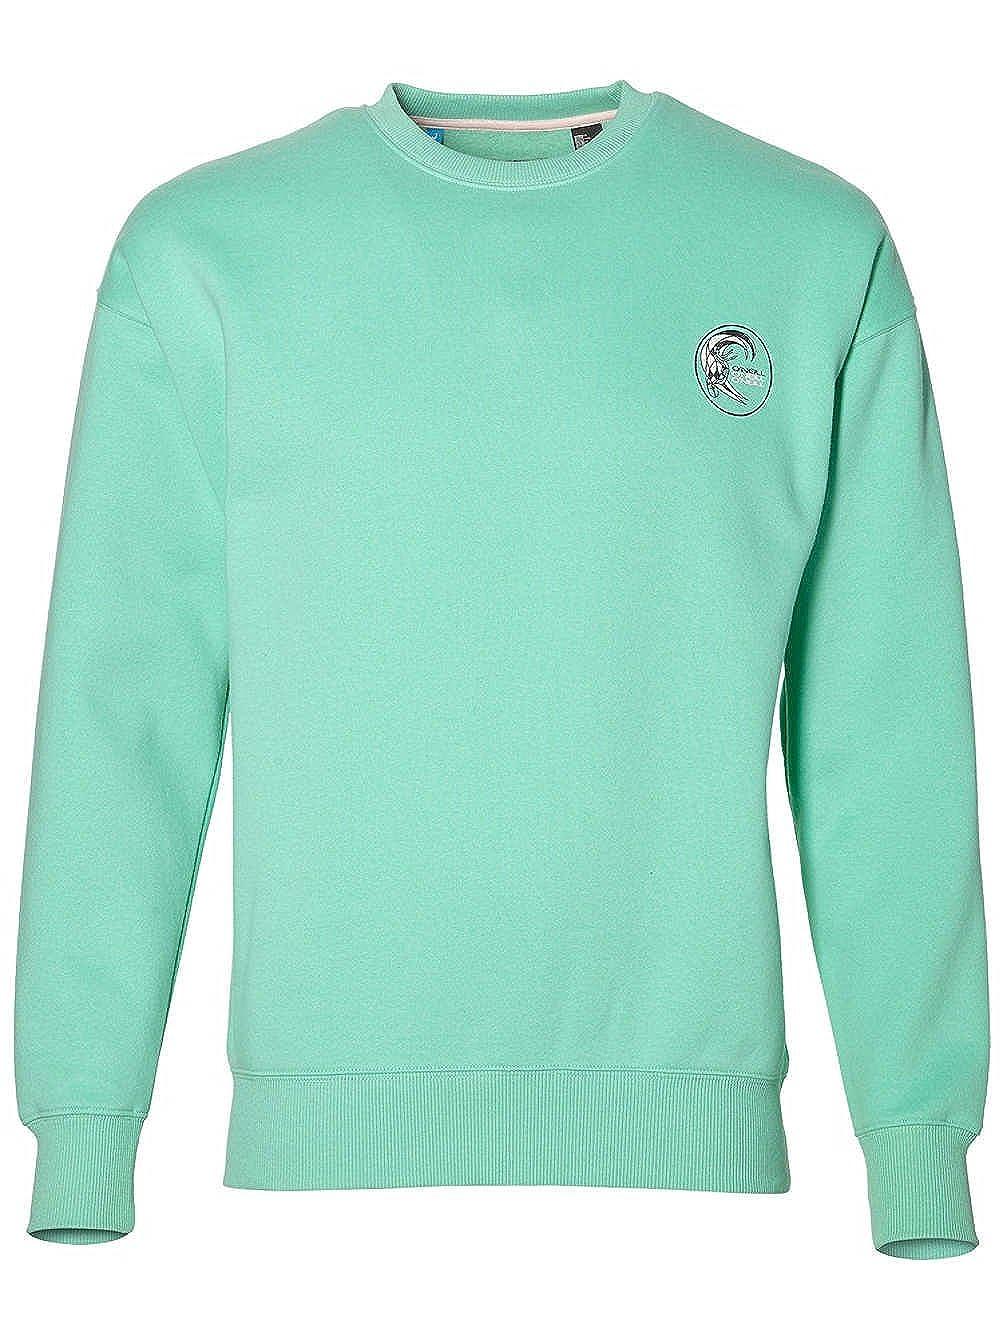 O& 039;NEILL Herren Sweatshirt blau S